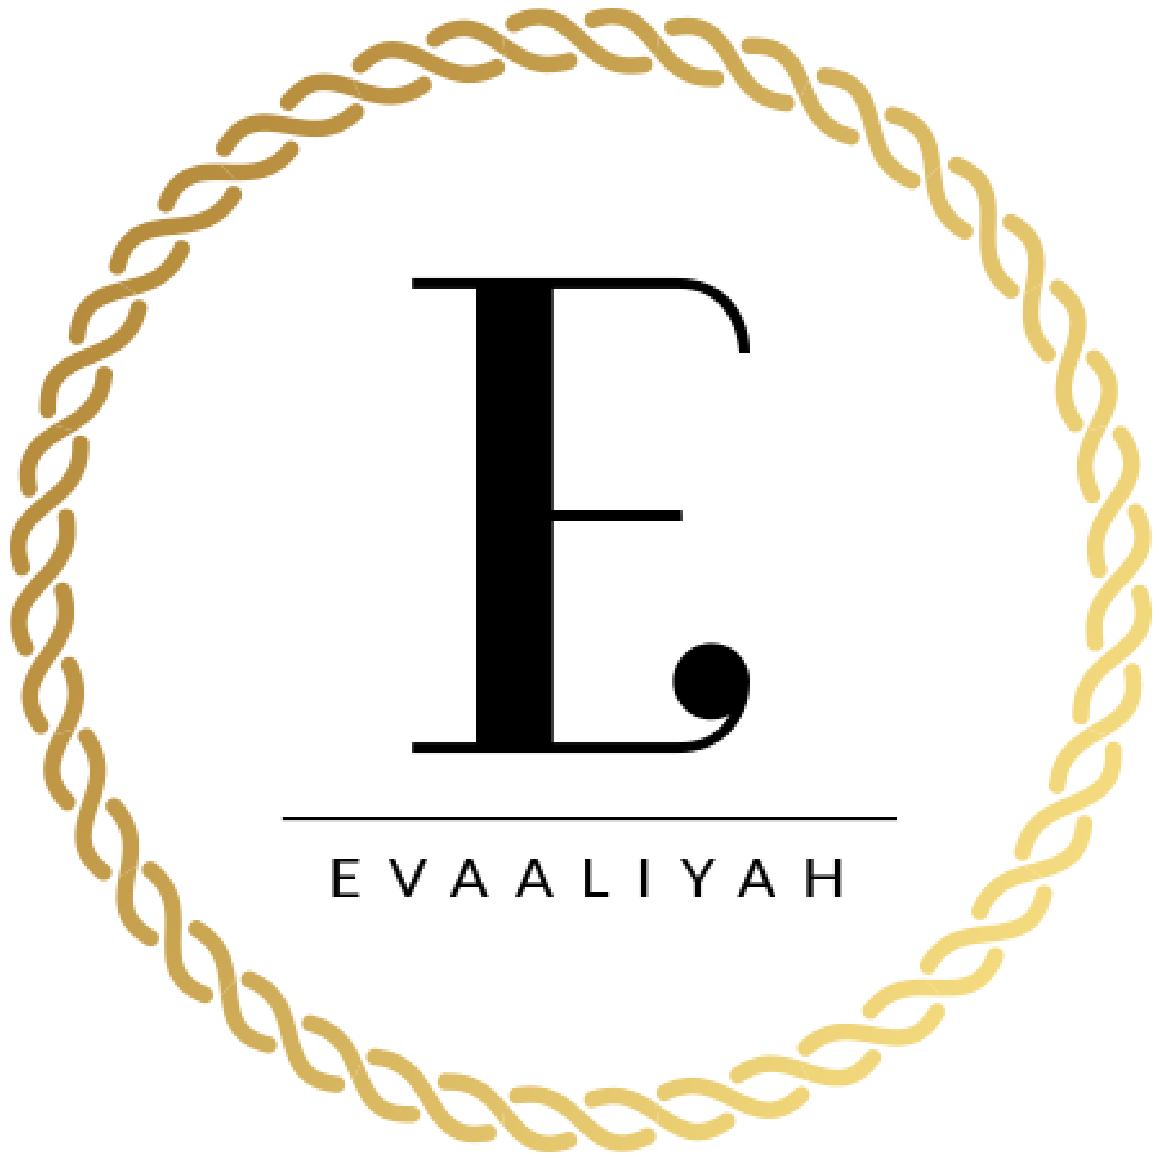 Evaaliyah-23.png